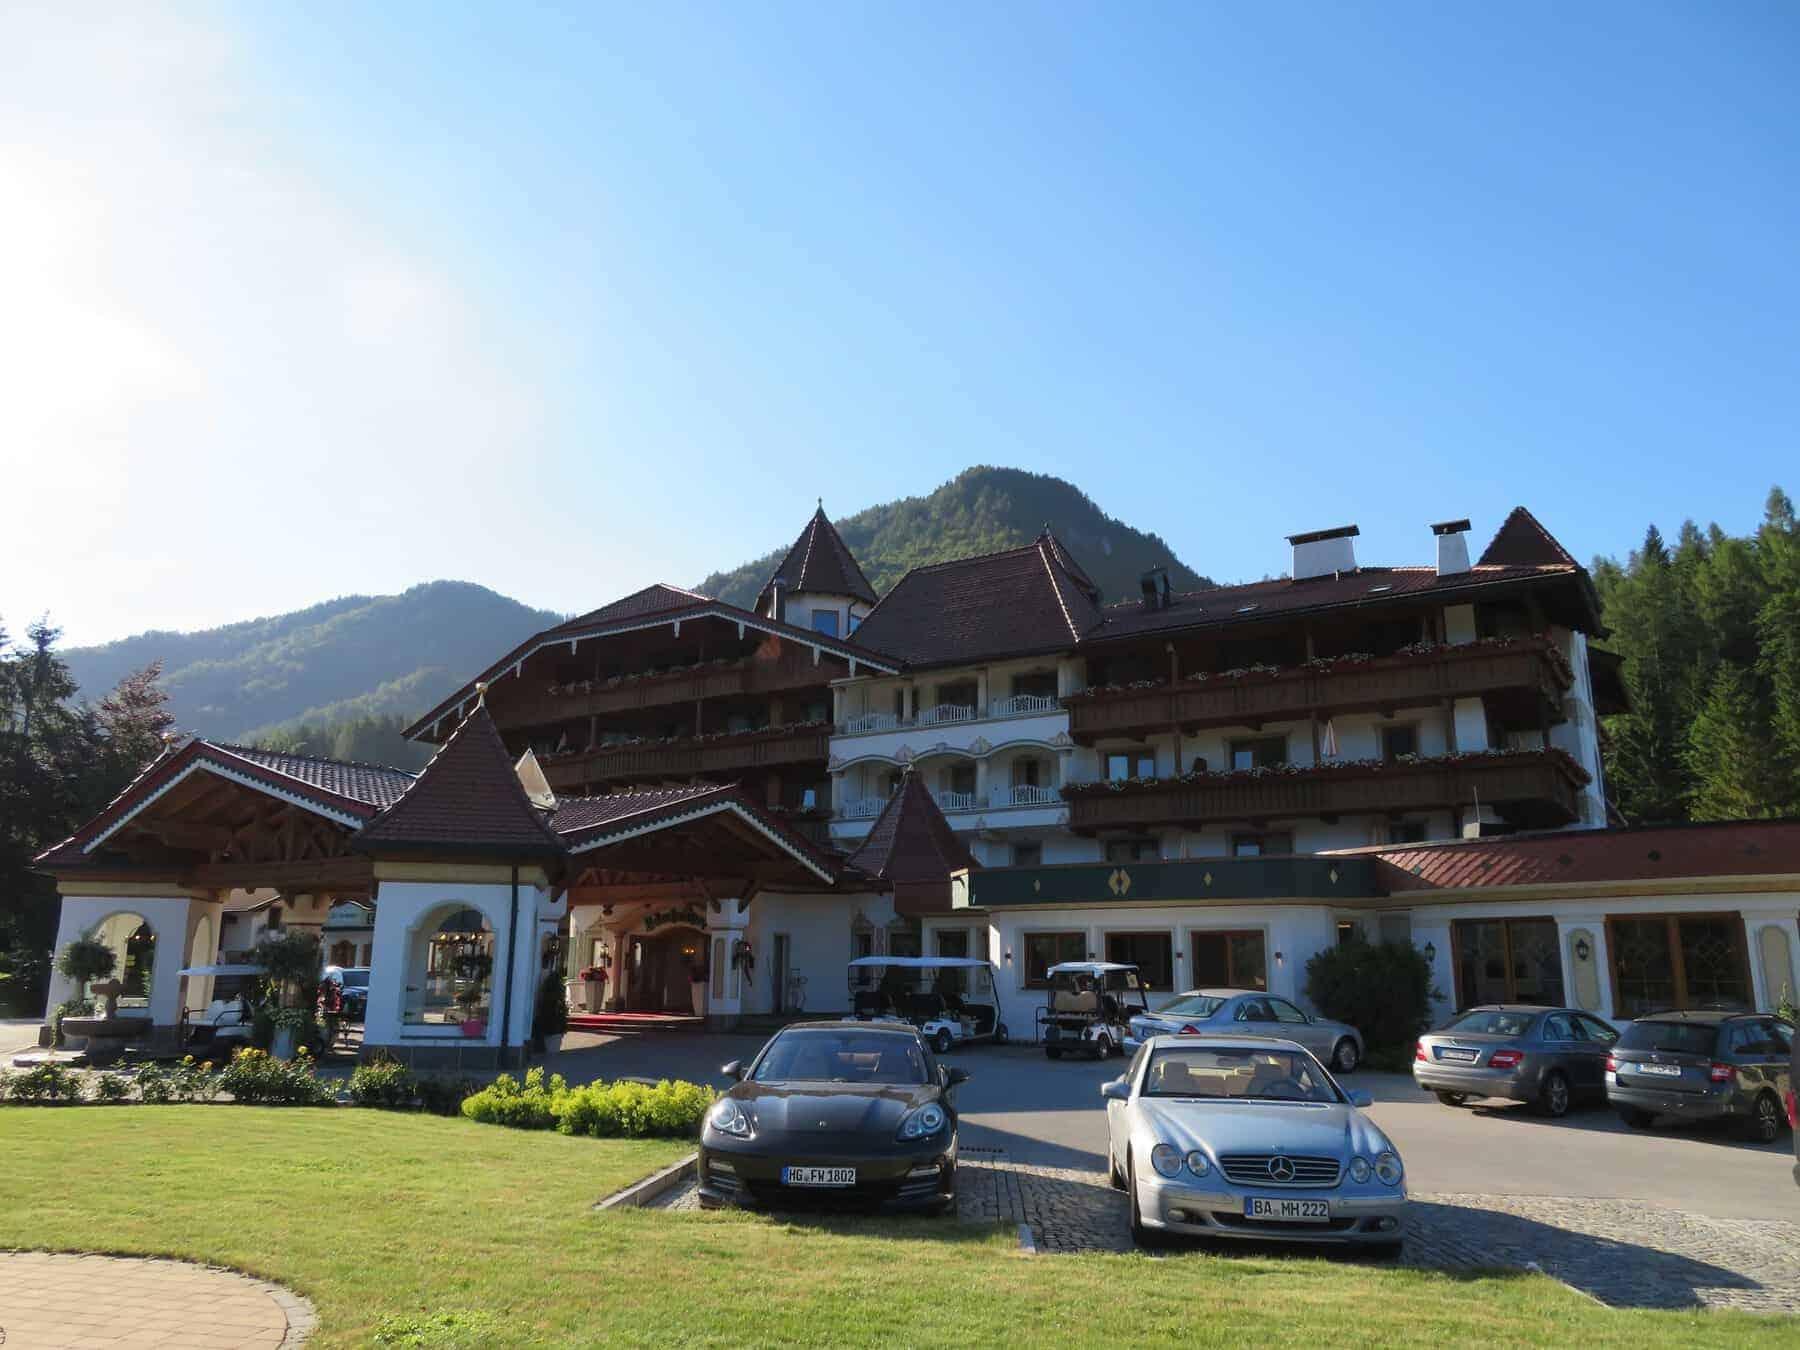 Hotel laerchenhof front entrance